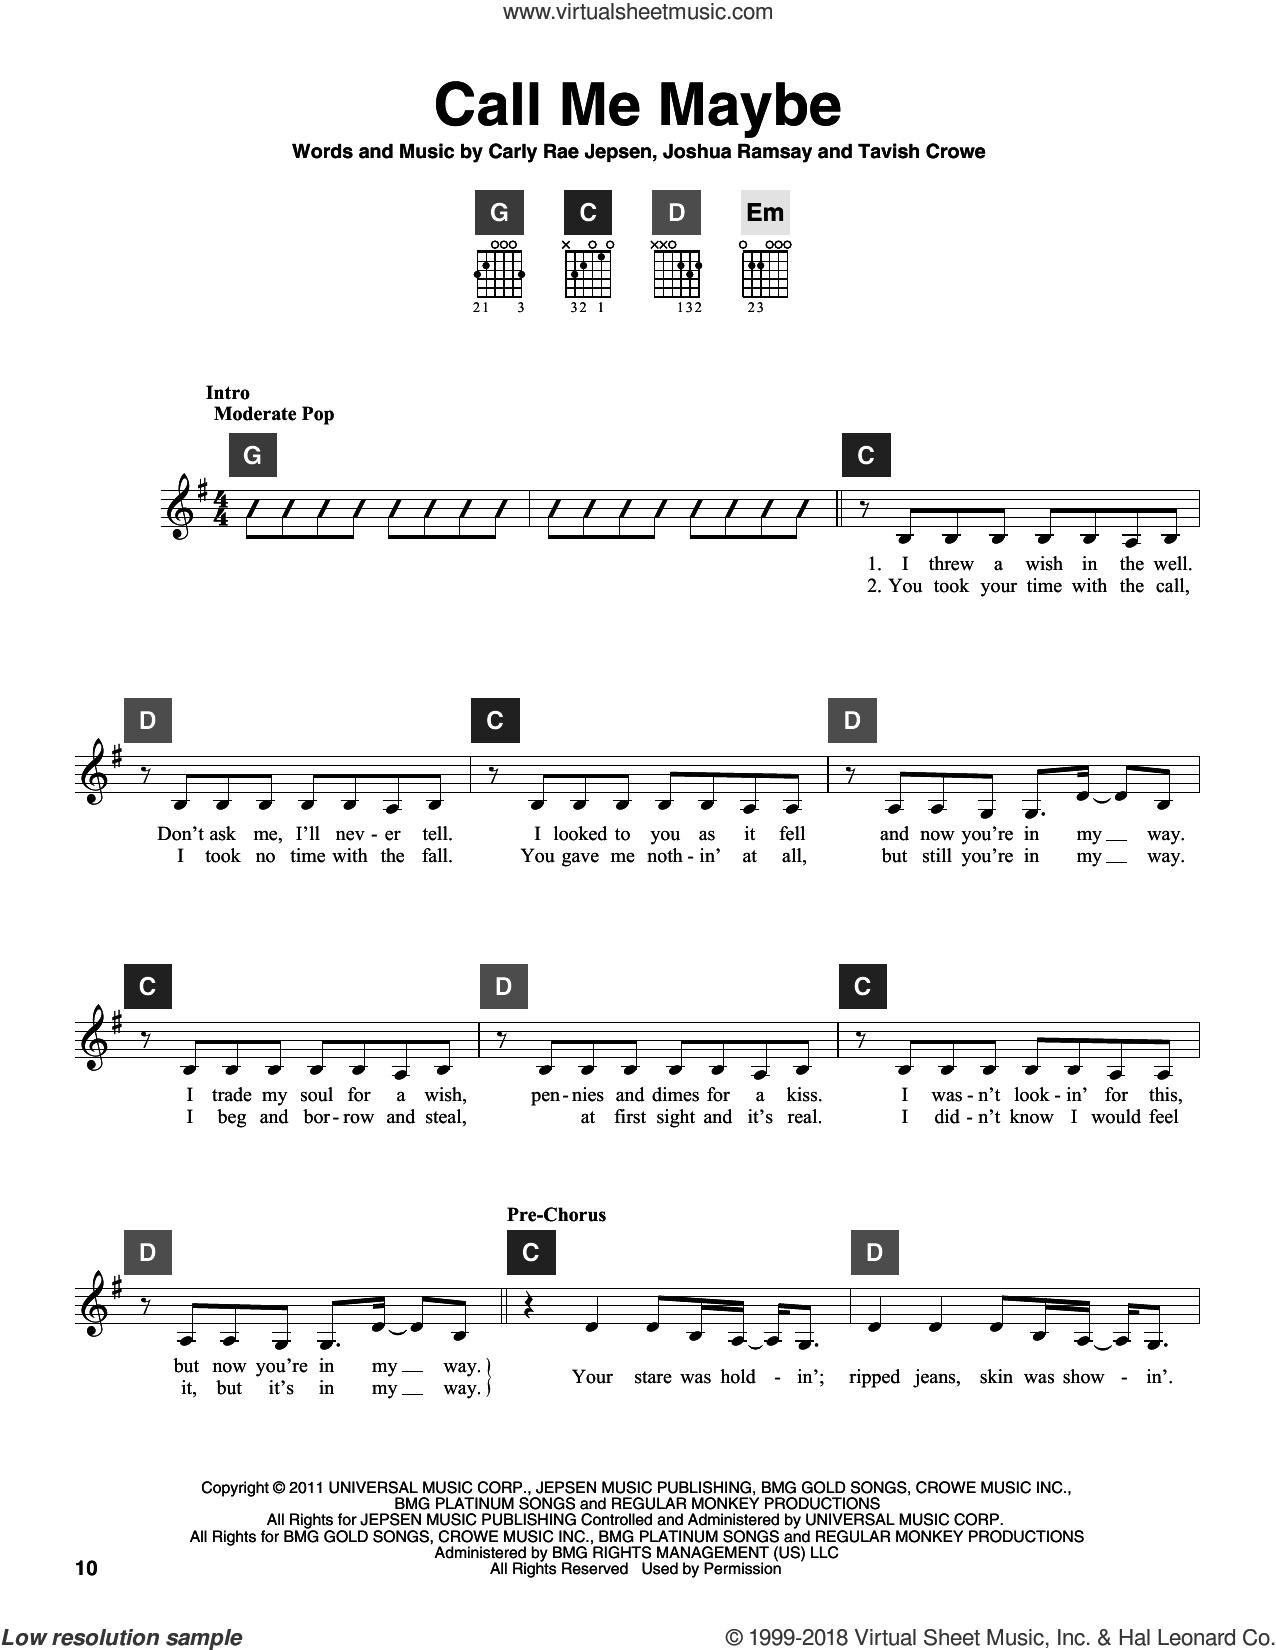 Call Me Maybe sheet music for guitar solo (ChordBuddy system) by Carly Rae Jepsen, Joshua Ramsay and Tavish Crowe, intermediate guitar (ChordBuddy system)